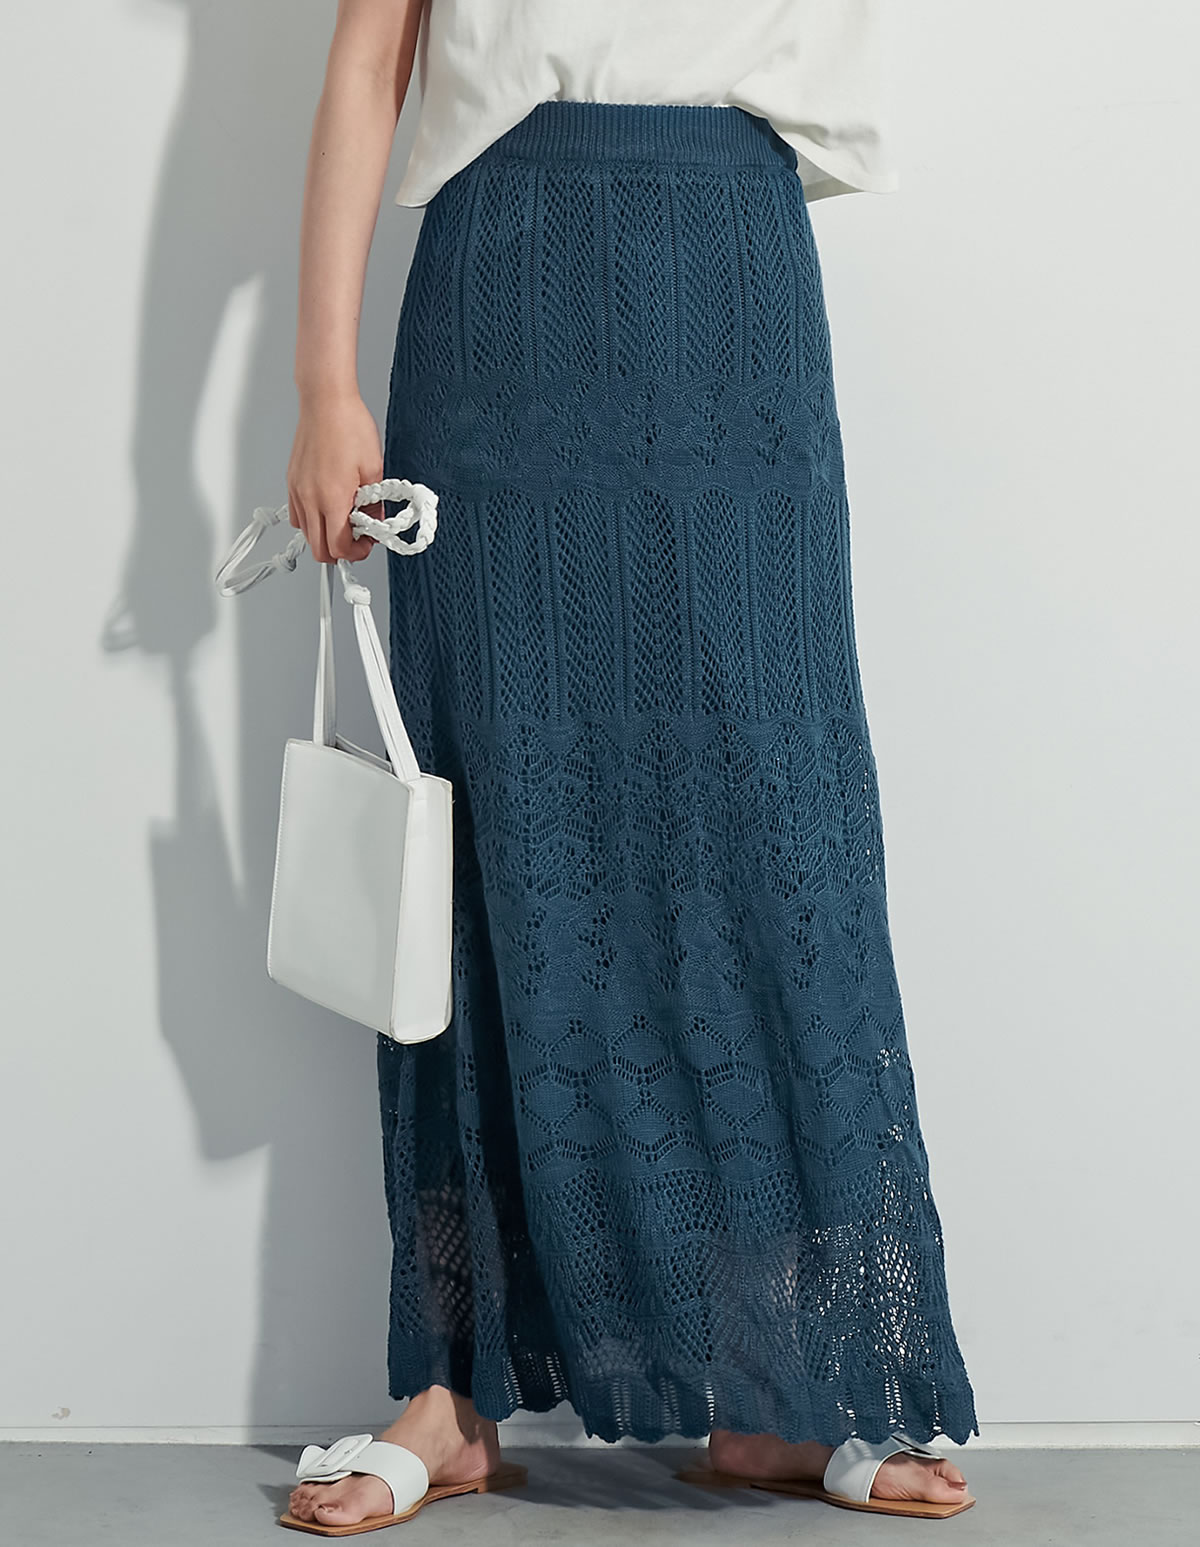 Re:EDIT‐リエディ [低身長向け/高身長向けサイズ対応][お家で洗える][近藤千尋さん着用]かぎ編みナローロングニットスカート